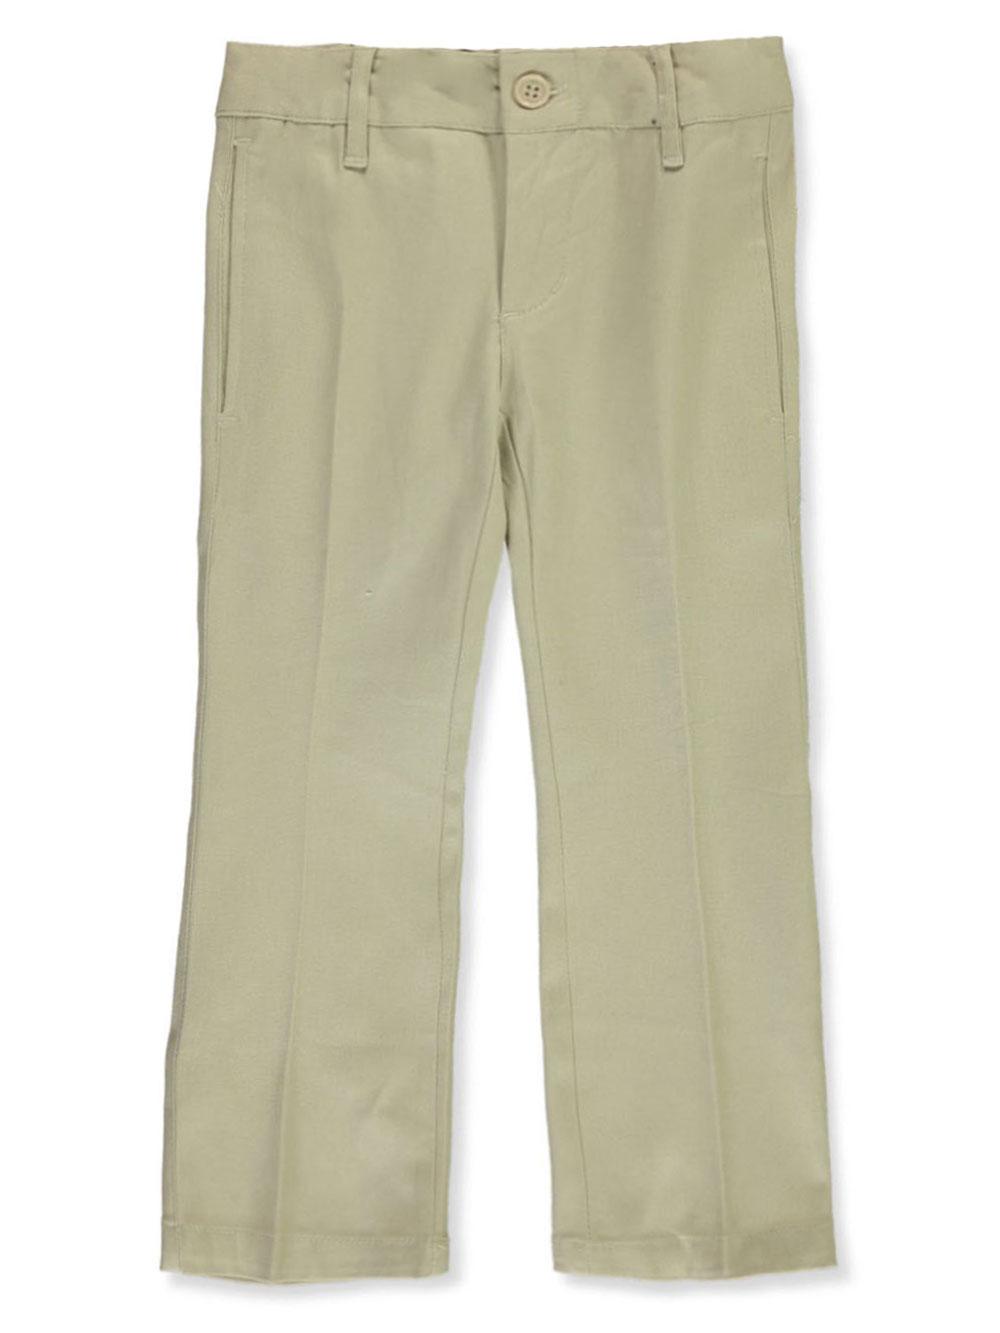 Denice Little Girls' Stretch Uniform Pants (Sizes 4 - 6X) at Sears.com